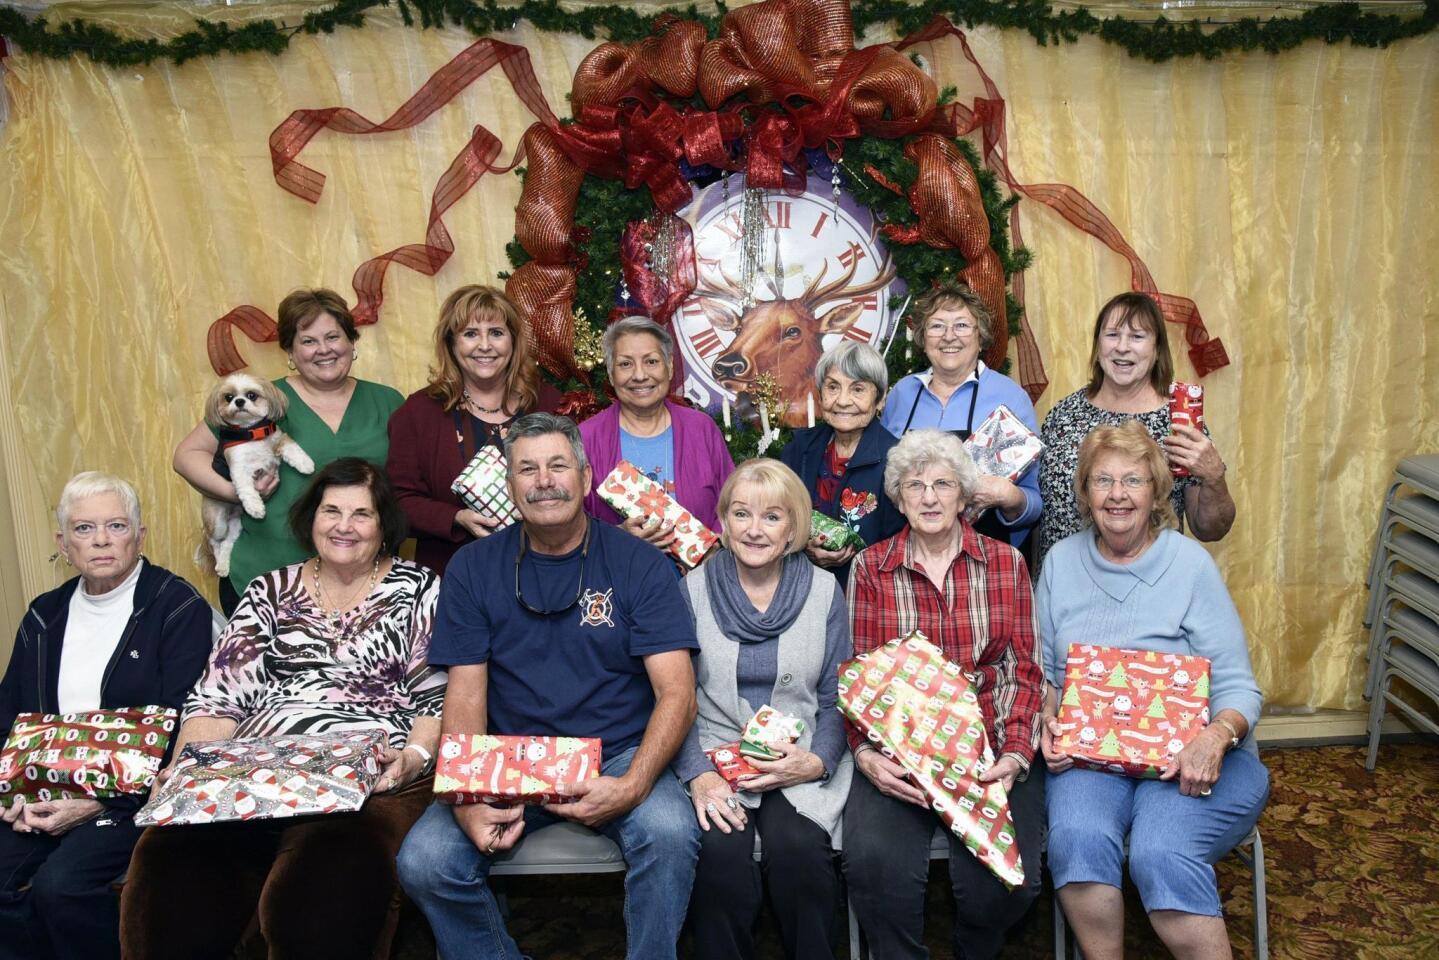 Encinitas Elks Lodge donates gifts to homeless veterans' families